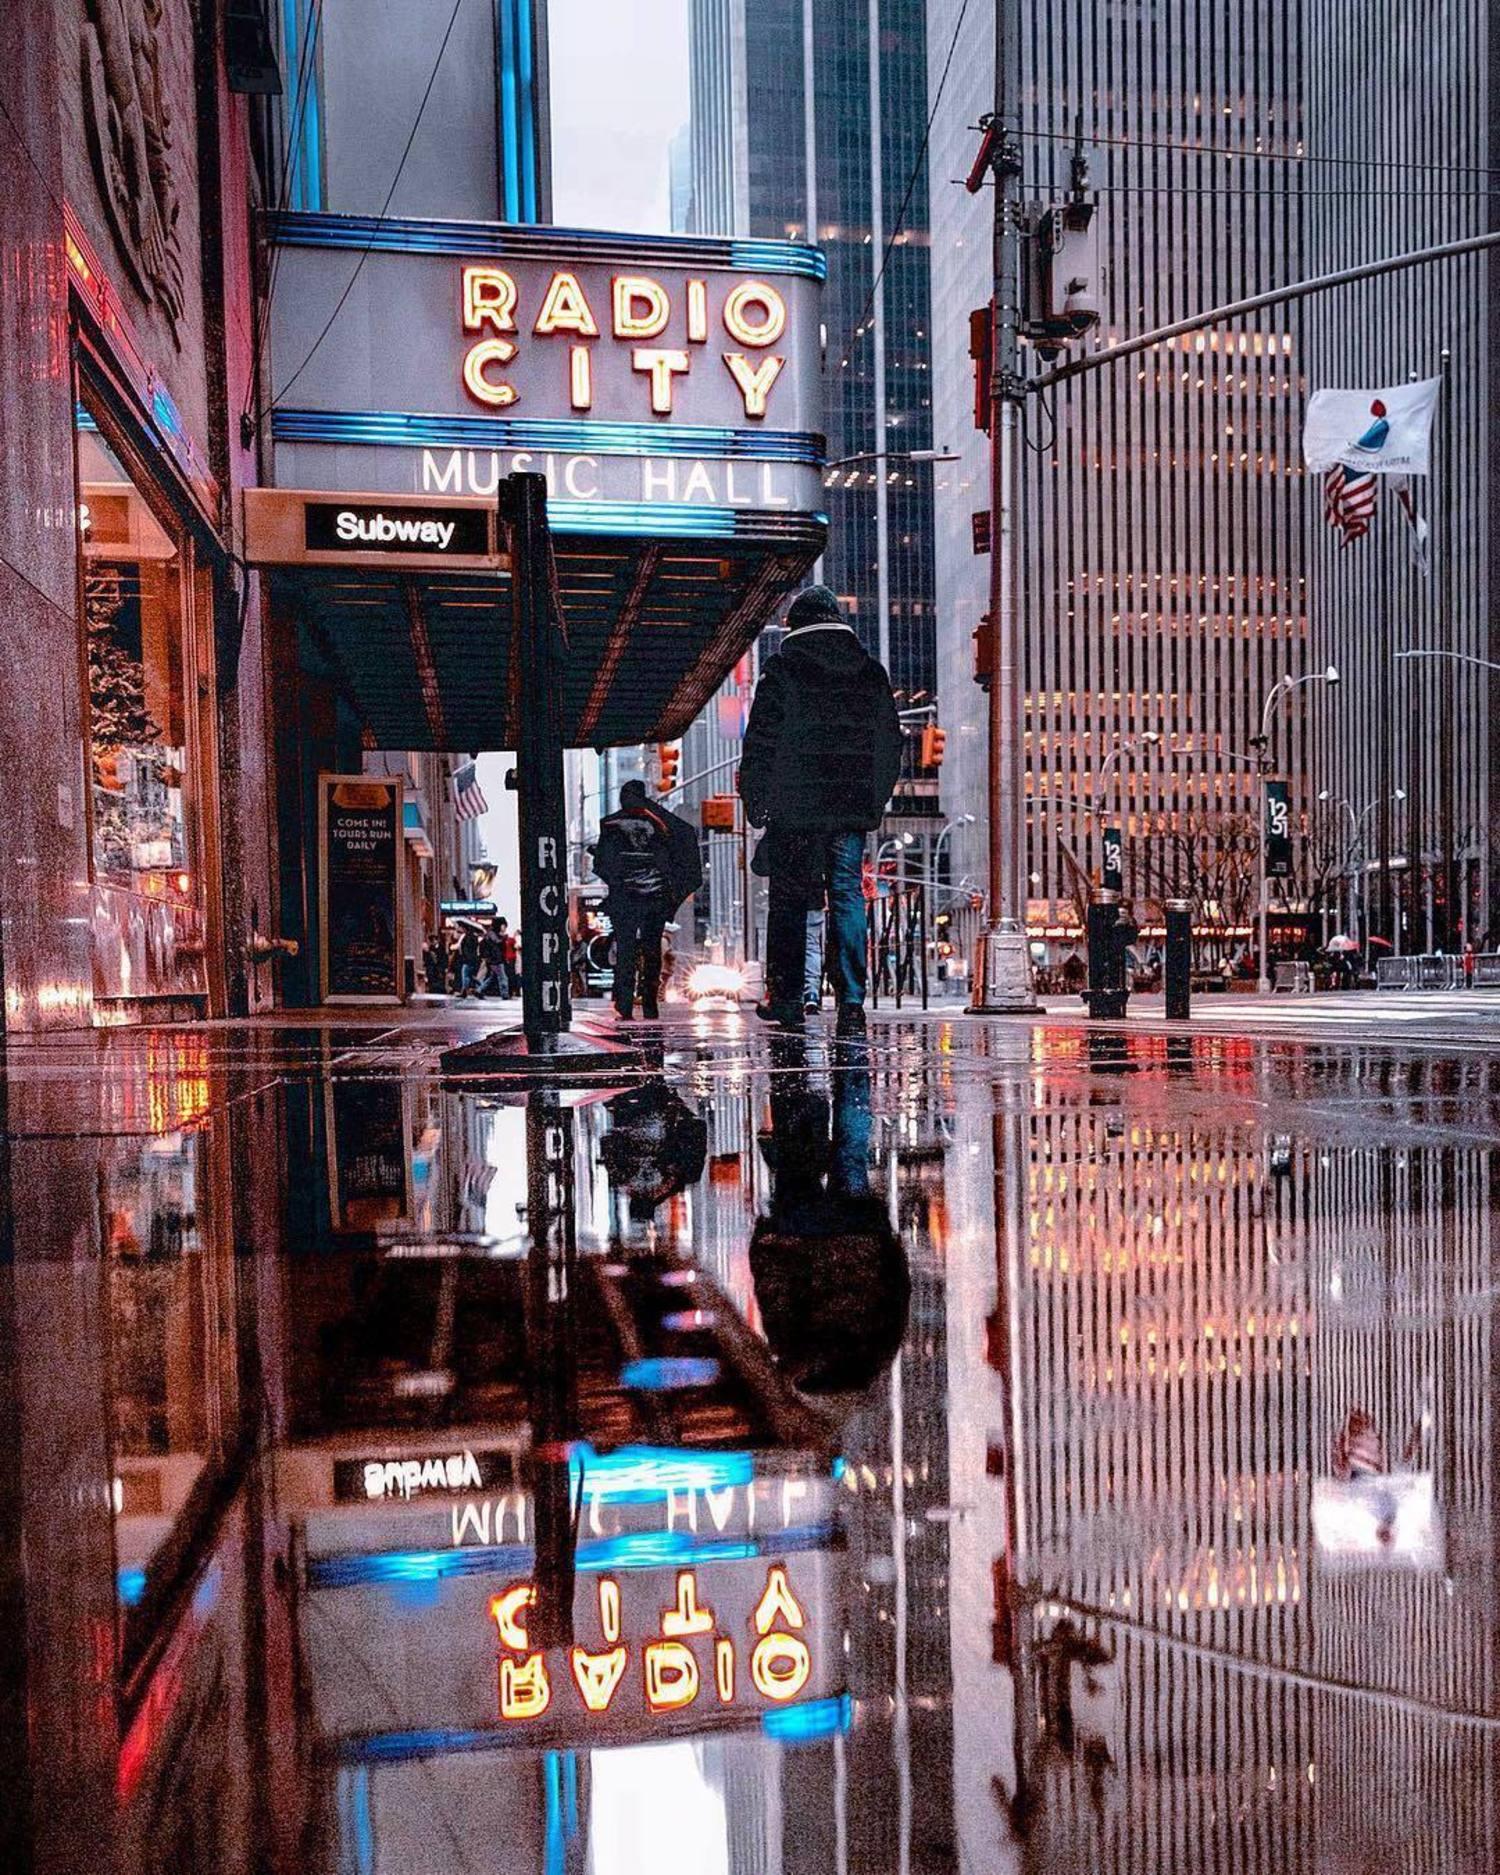 6th Avenue, New York, New York. Photo via @ph88rh #viewingnyc #nyc #newyork #newyorkcity #radiocitymusichall